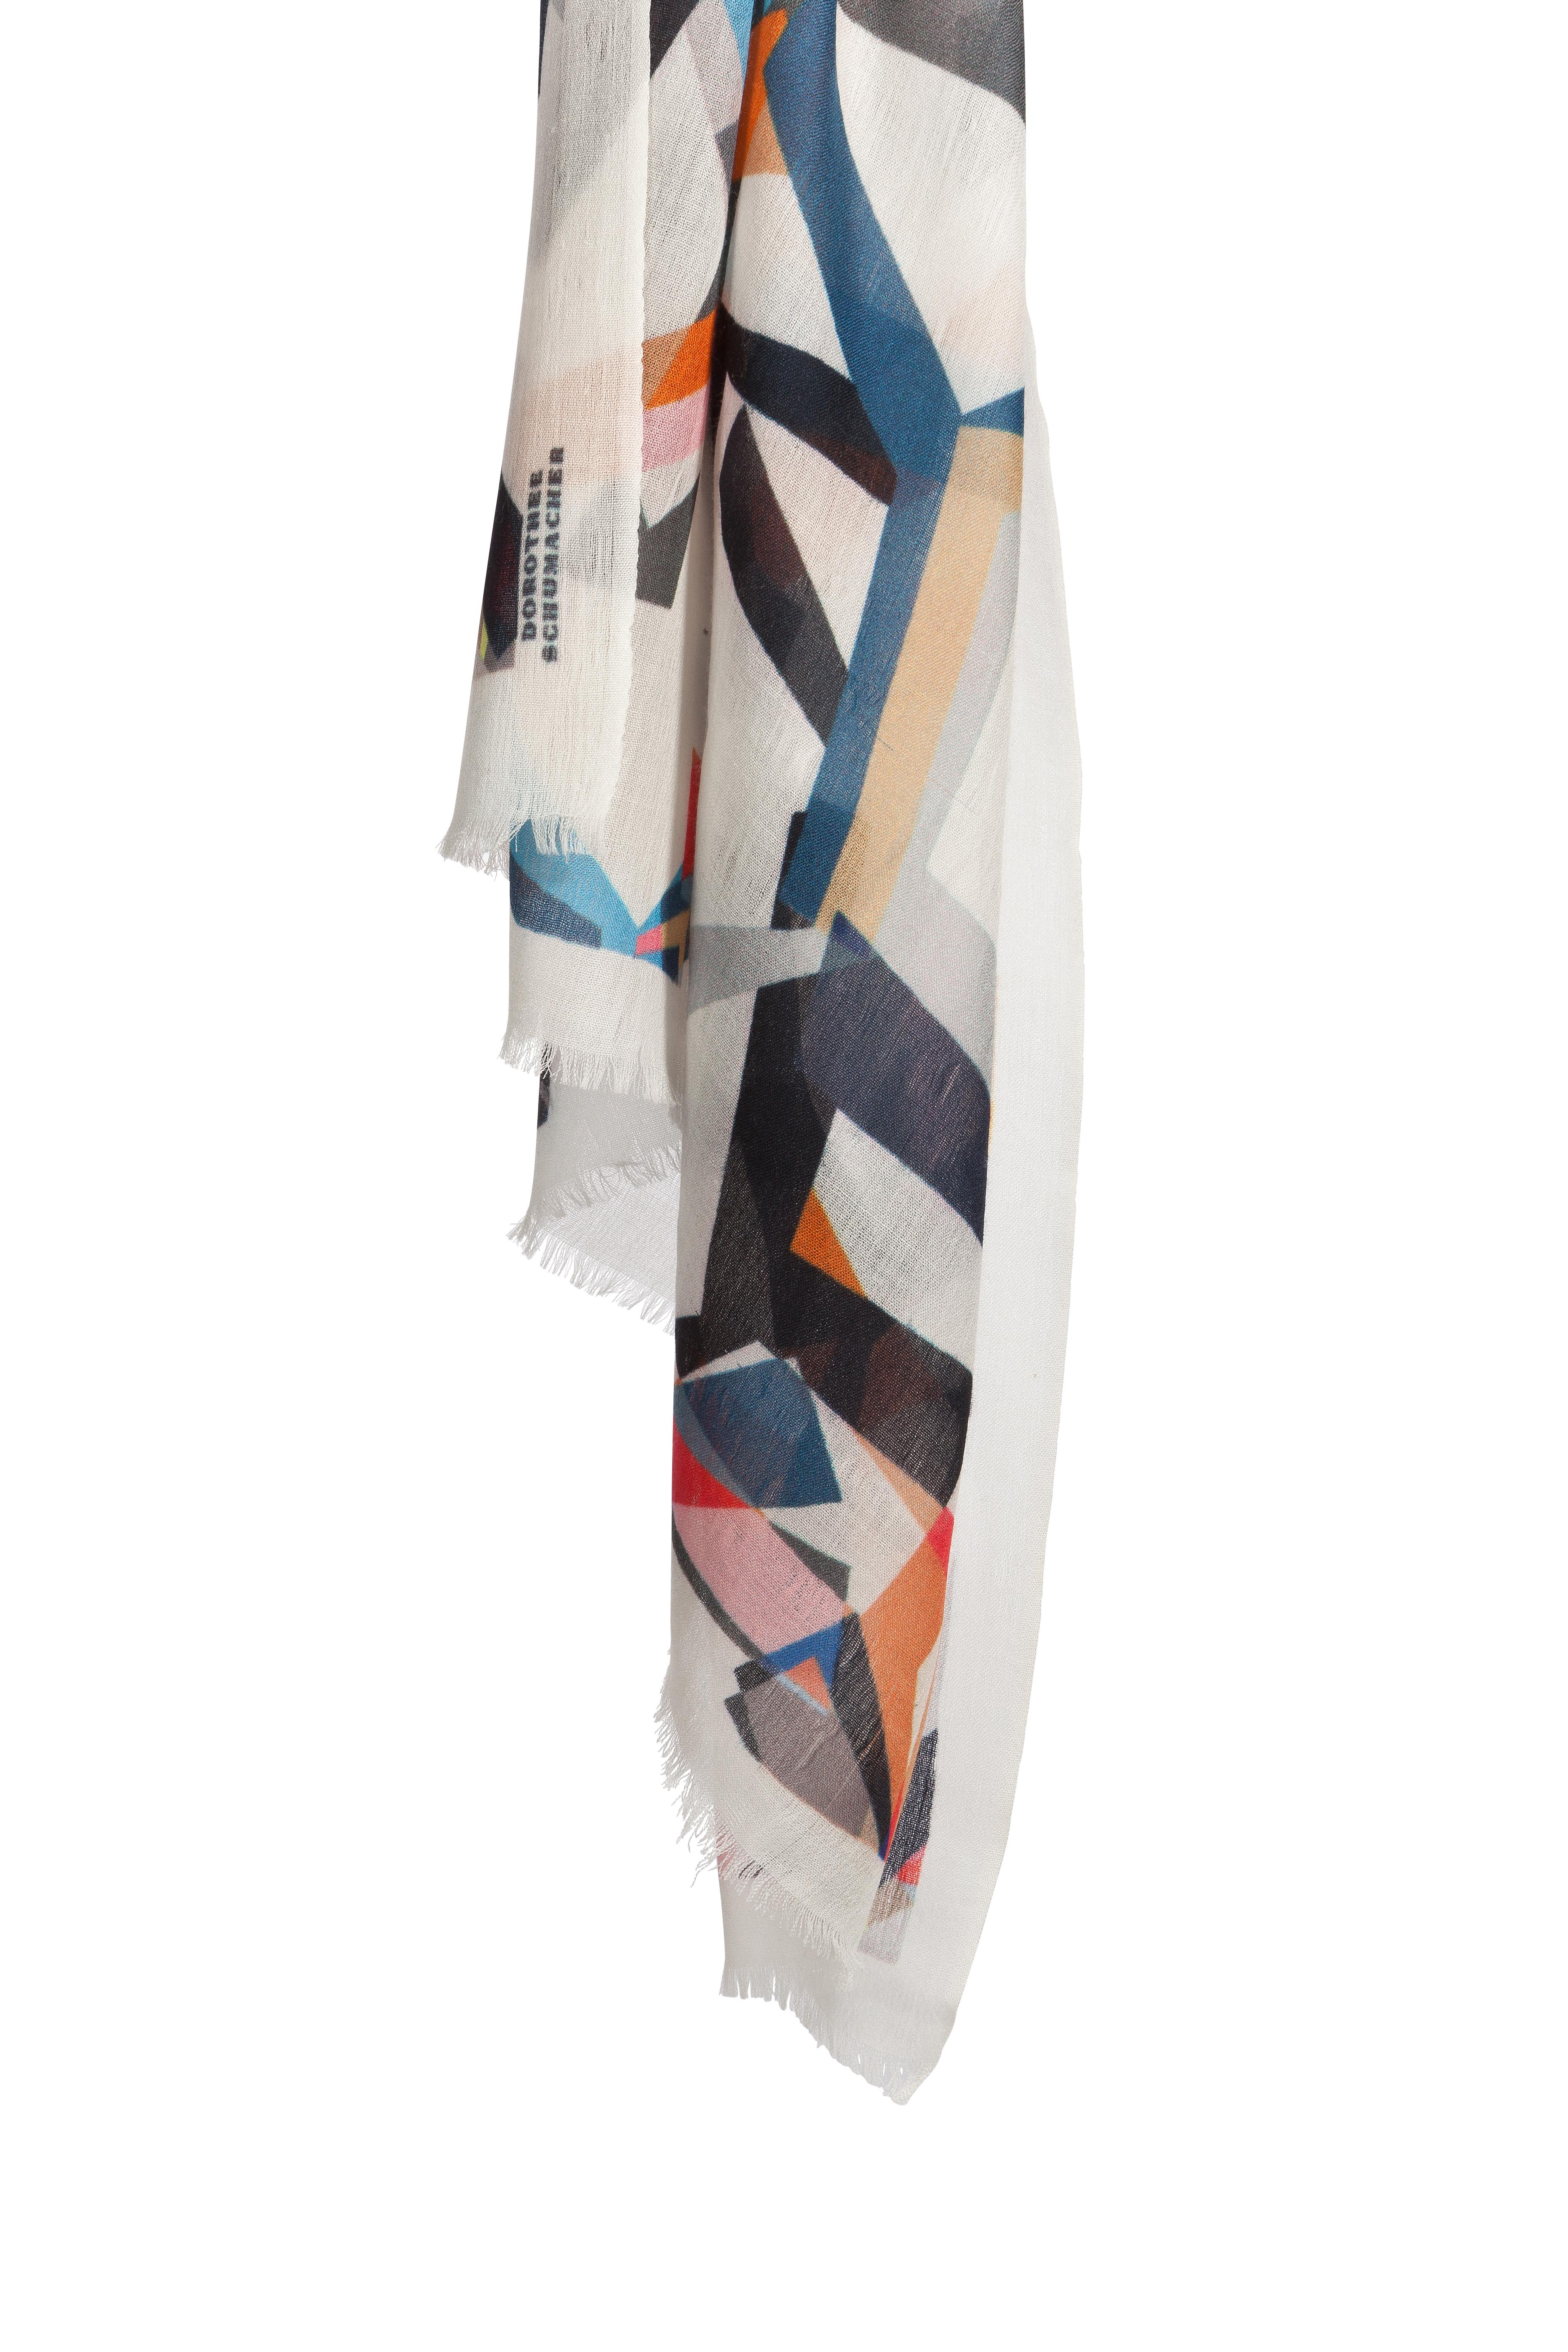 dorothee schumacher graphic movement wool scarf lyst